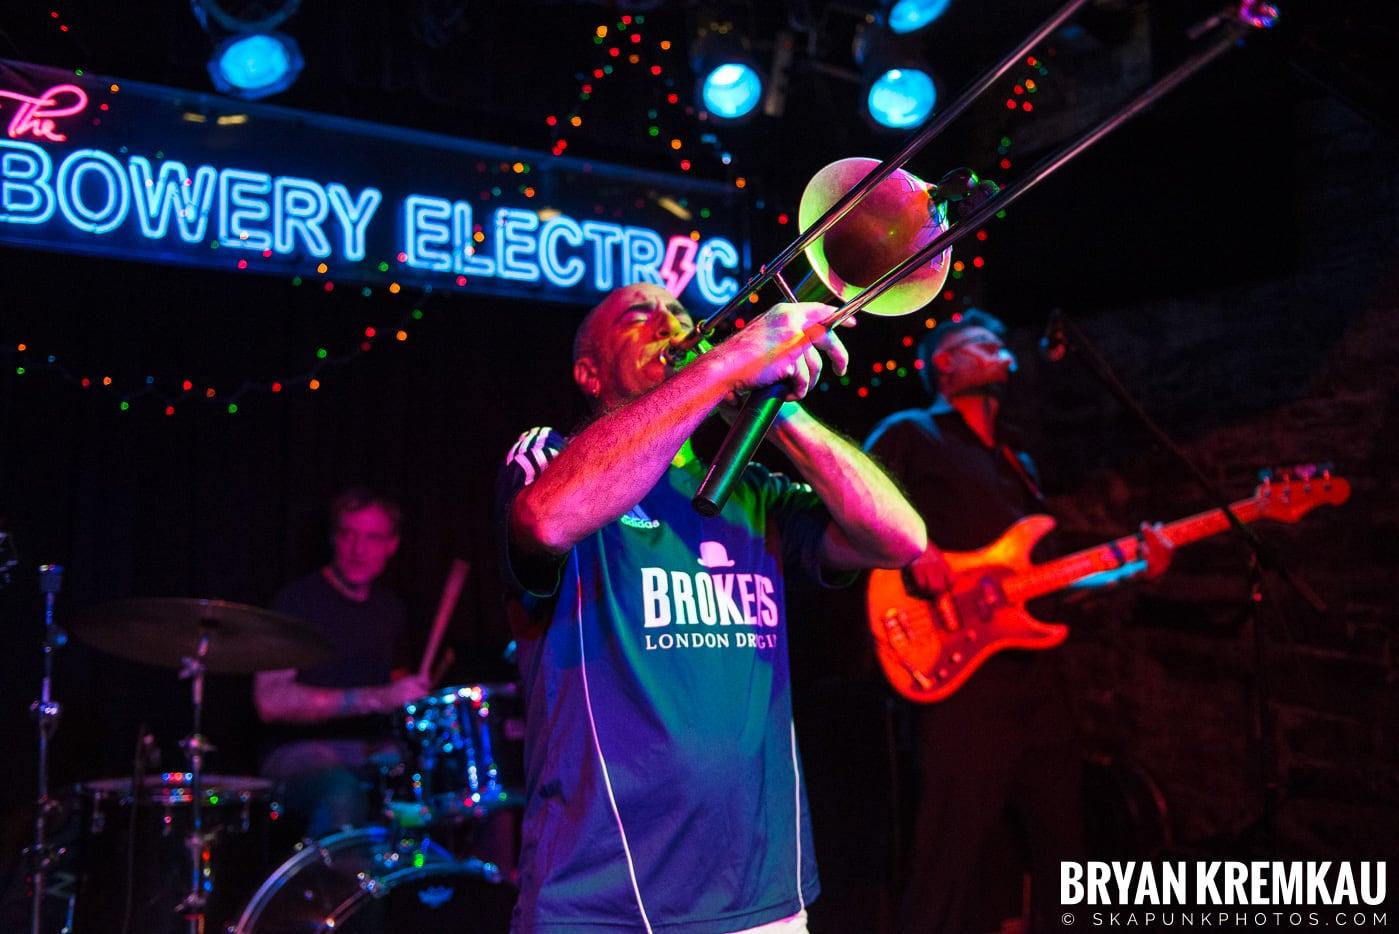 Cenzo @ Bowery Electric, NYC - 11.17.18 (28)